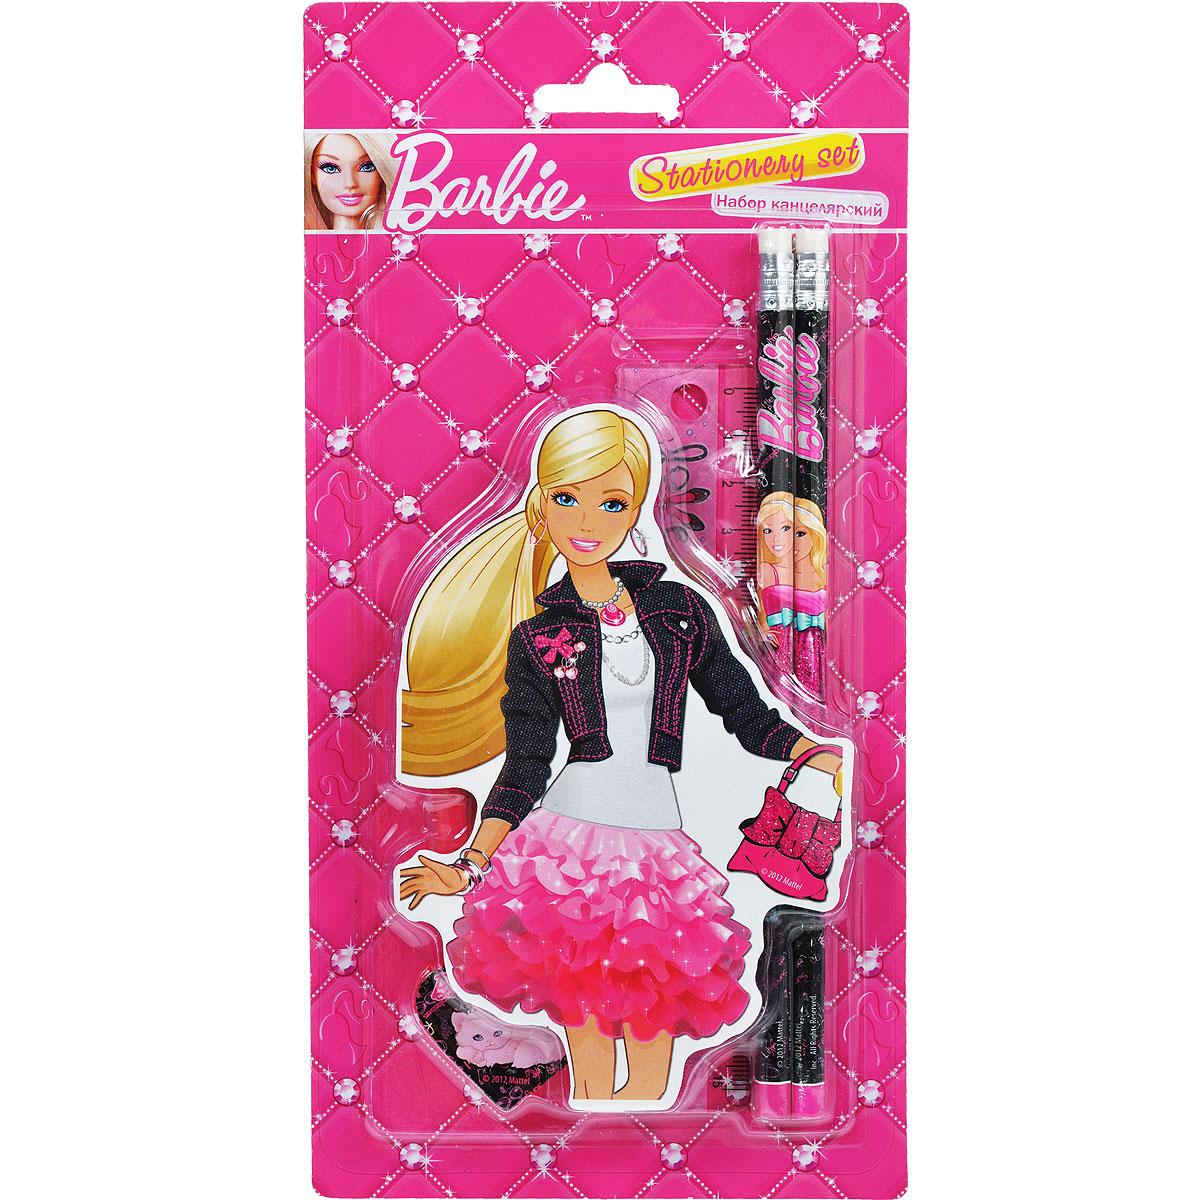 Канцелярский набор  Barbie , 5 предметов -  Канцелярские наборы